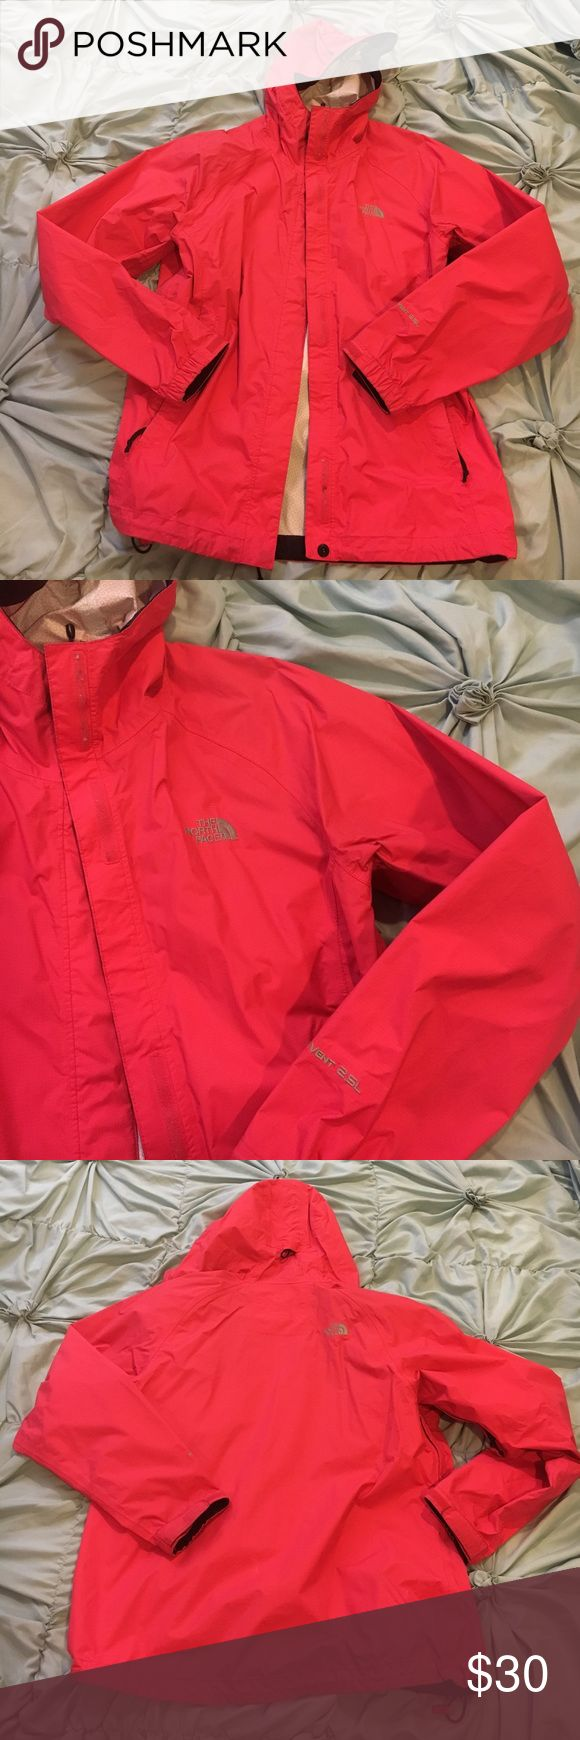 The North Face Rain Shell Jacket Lightweight rain jacket from The North Face, good as new. The North Face Jackets & Coats